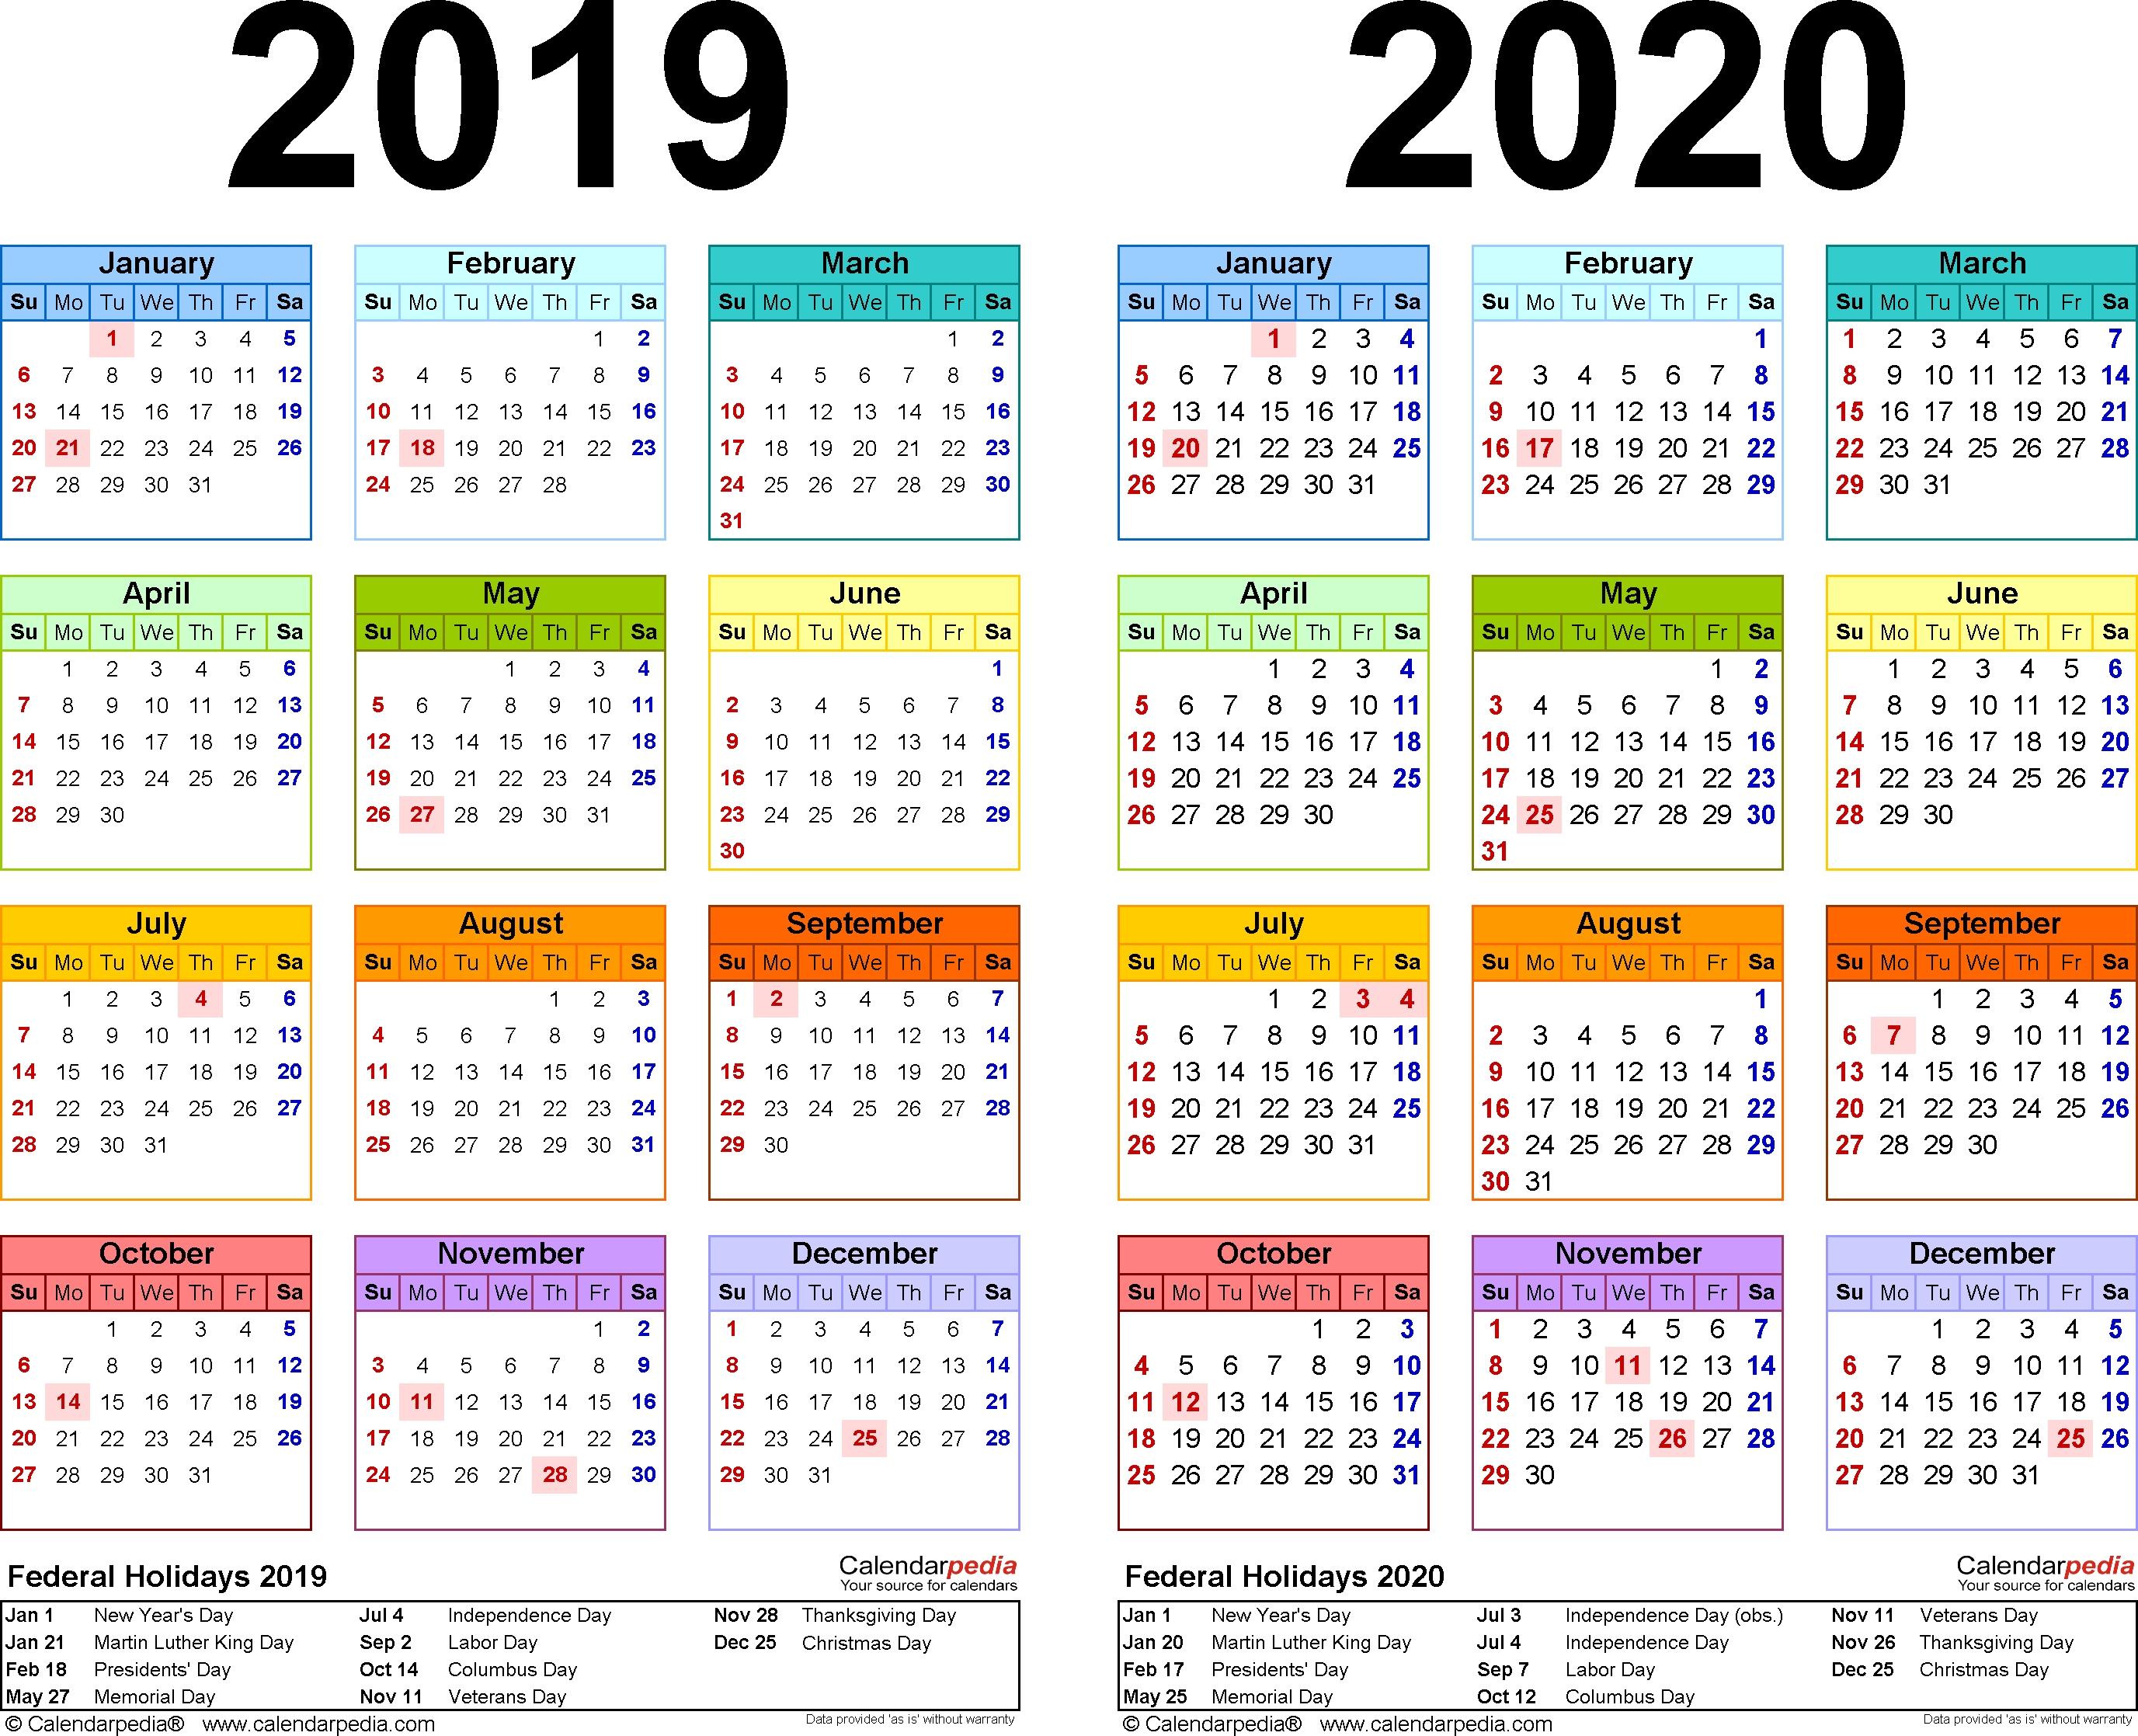 2019-2020 Calendar - Free Printable Two-Year Excel Calendars inside U Of T 2019 2020 Calendar